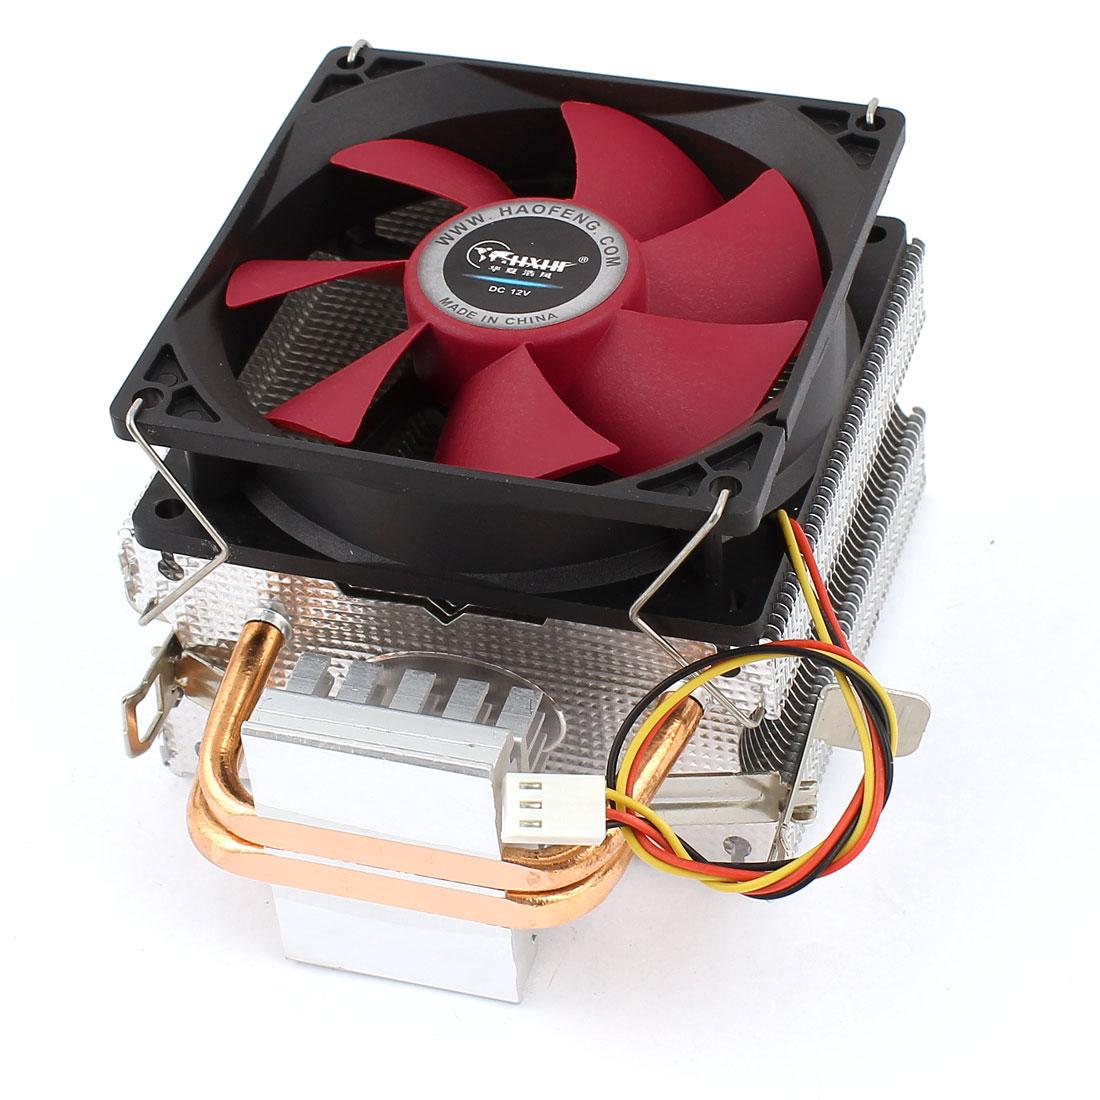 DC 12V 11dB 3Pins Connector CPU Cooler Cooling Fan Heatsink for LGA775/1366/1156